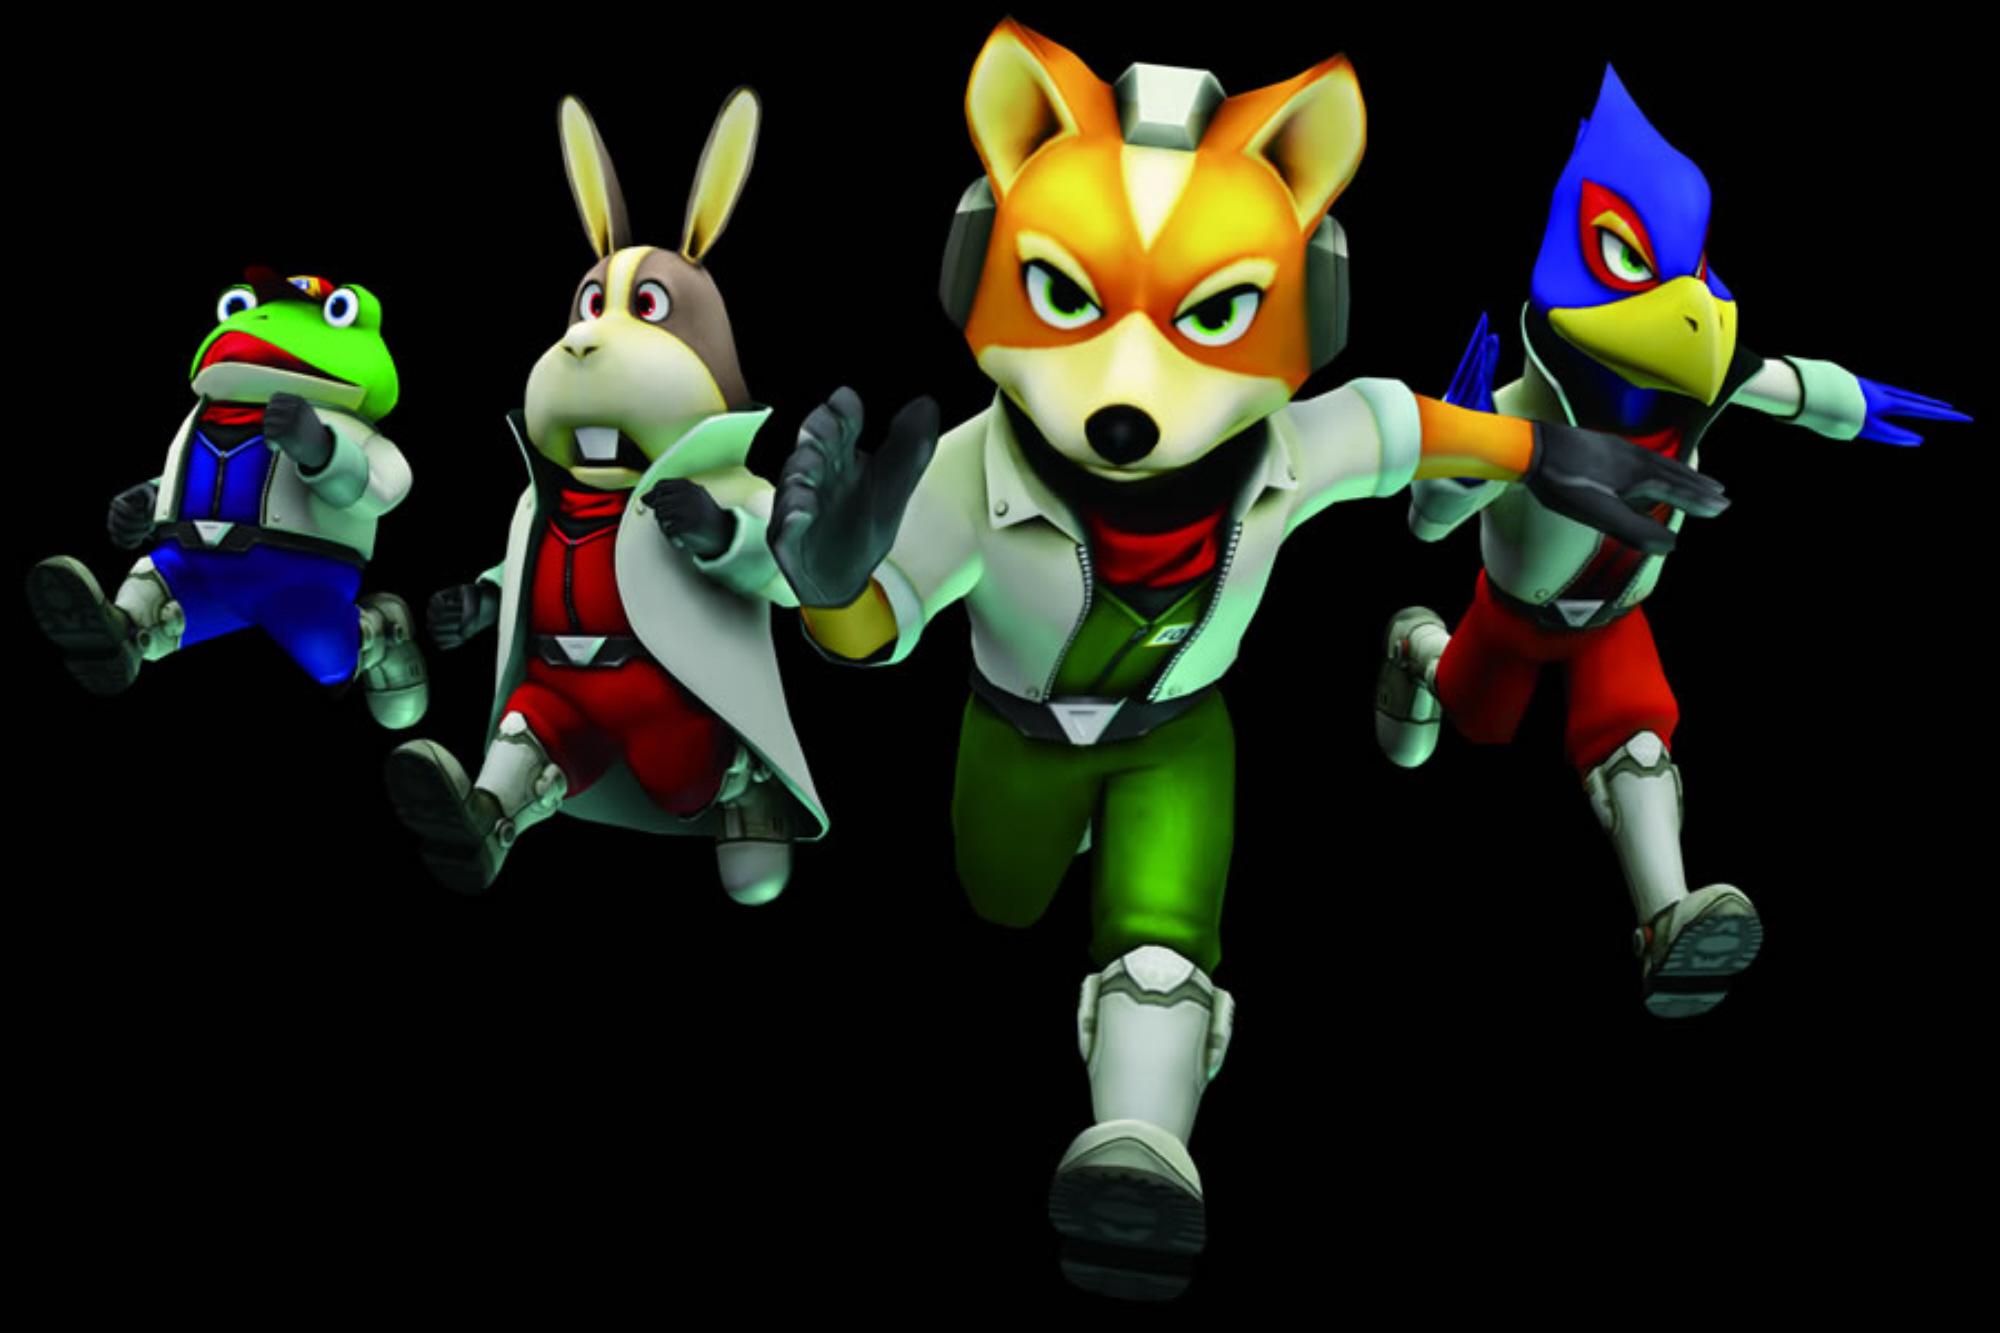 Star fox 64 virtual console review gamespot.